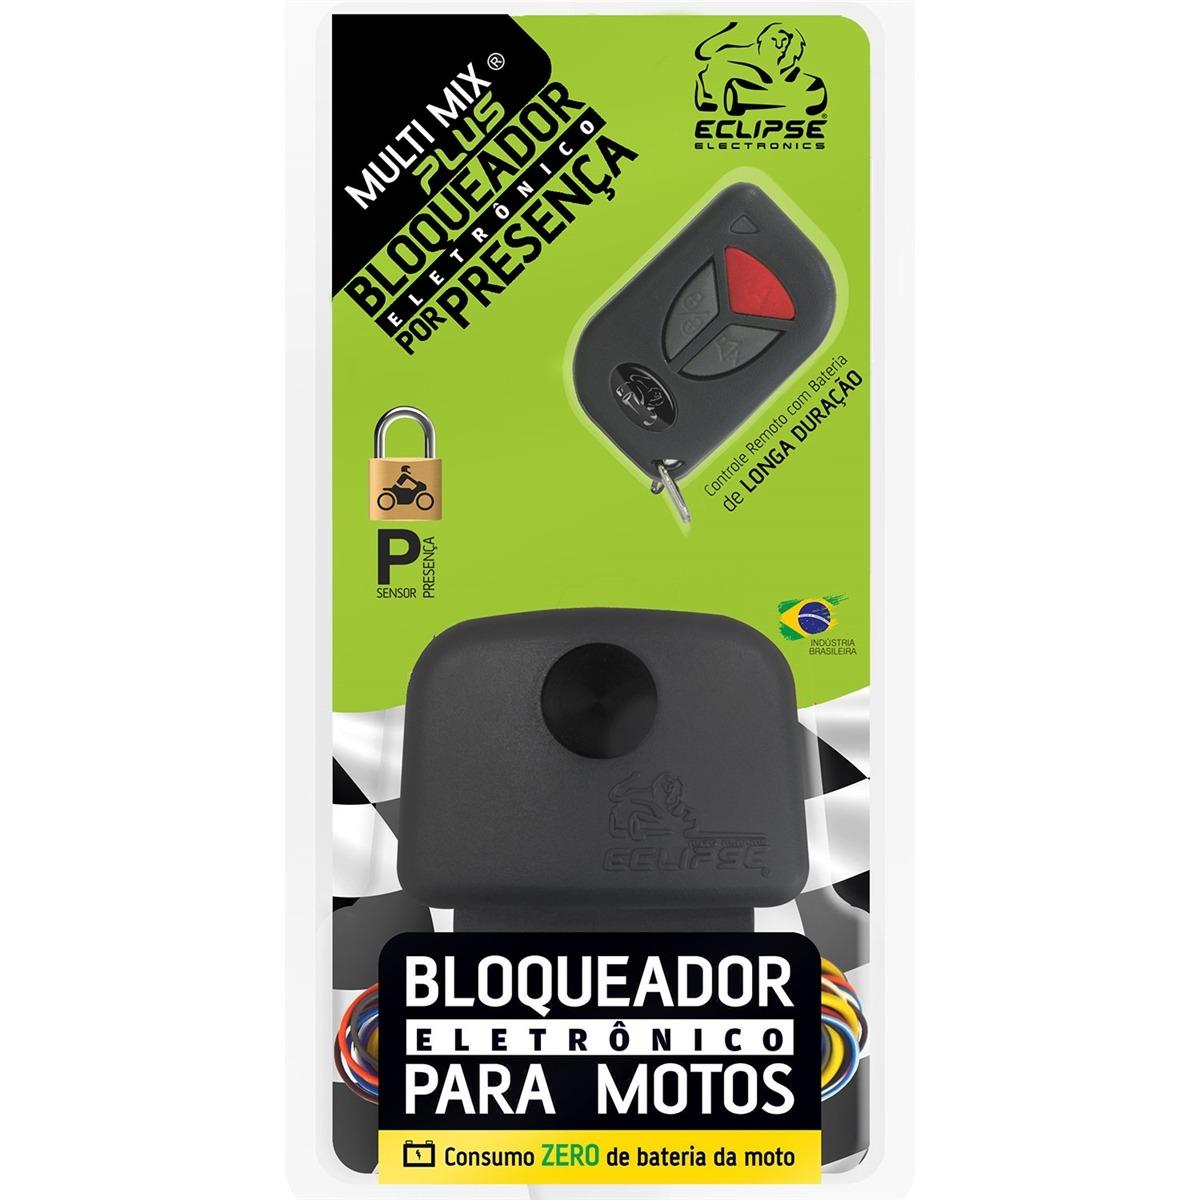 Alarme Bloqueador Moto Eclipse Anti Furto Presença